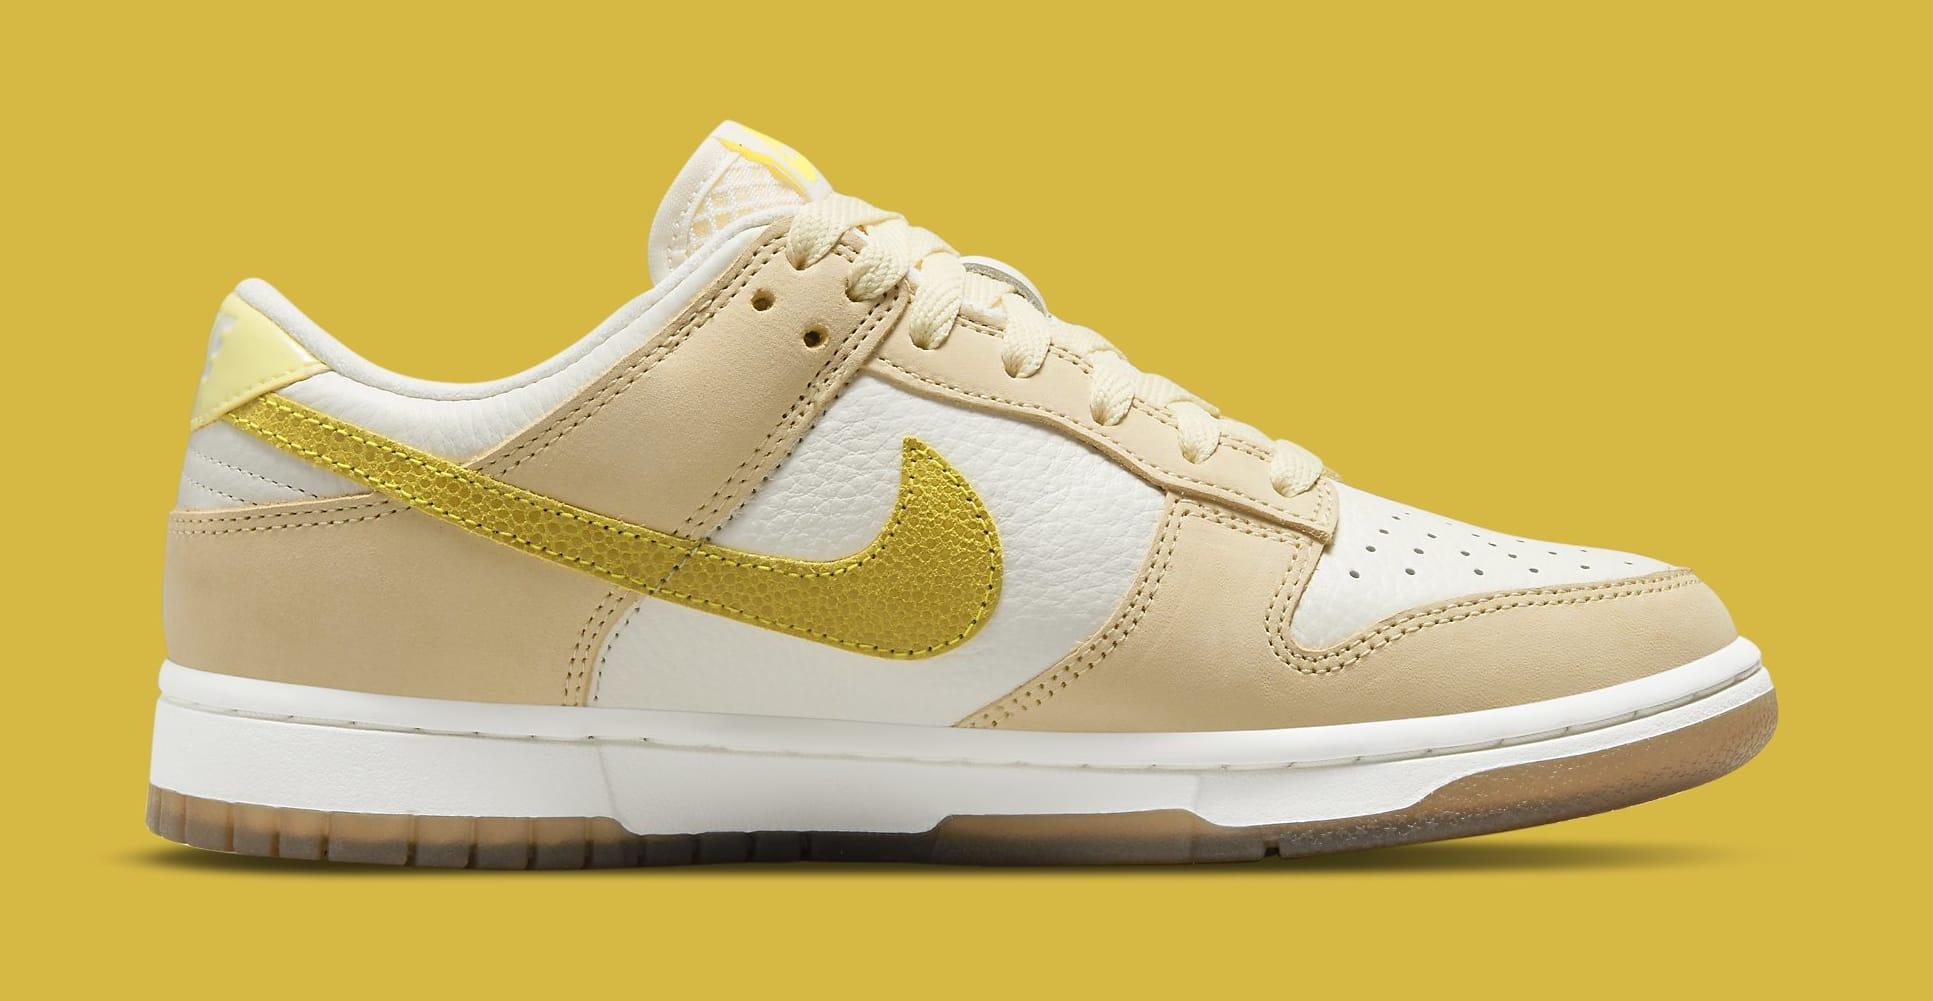 Nike Dunk Low 'Lemon Drop' DJ6902-700 Medial